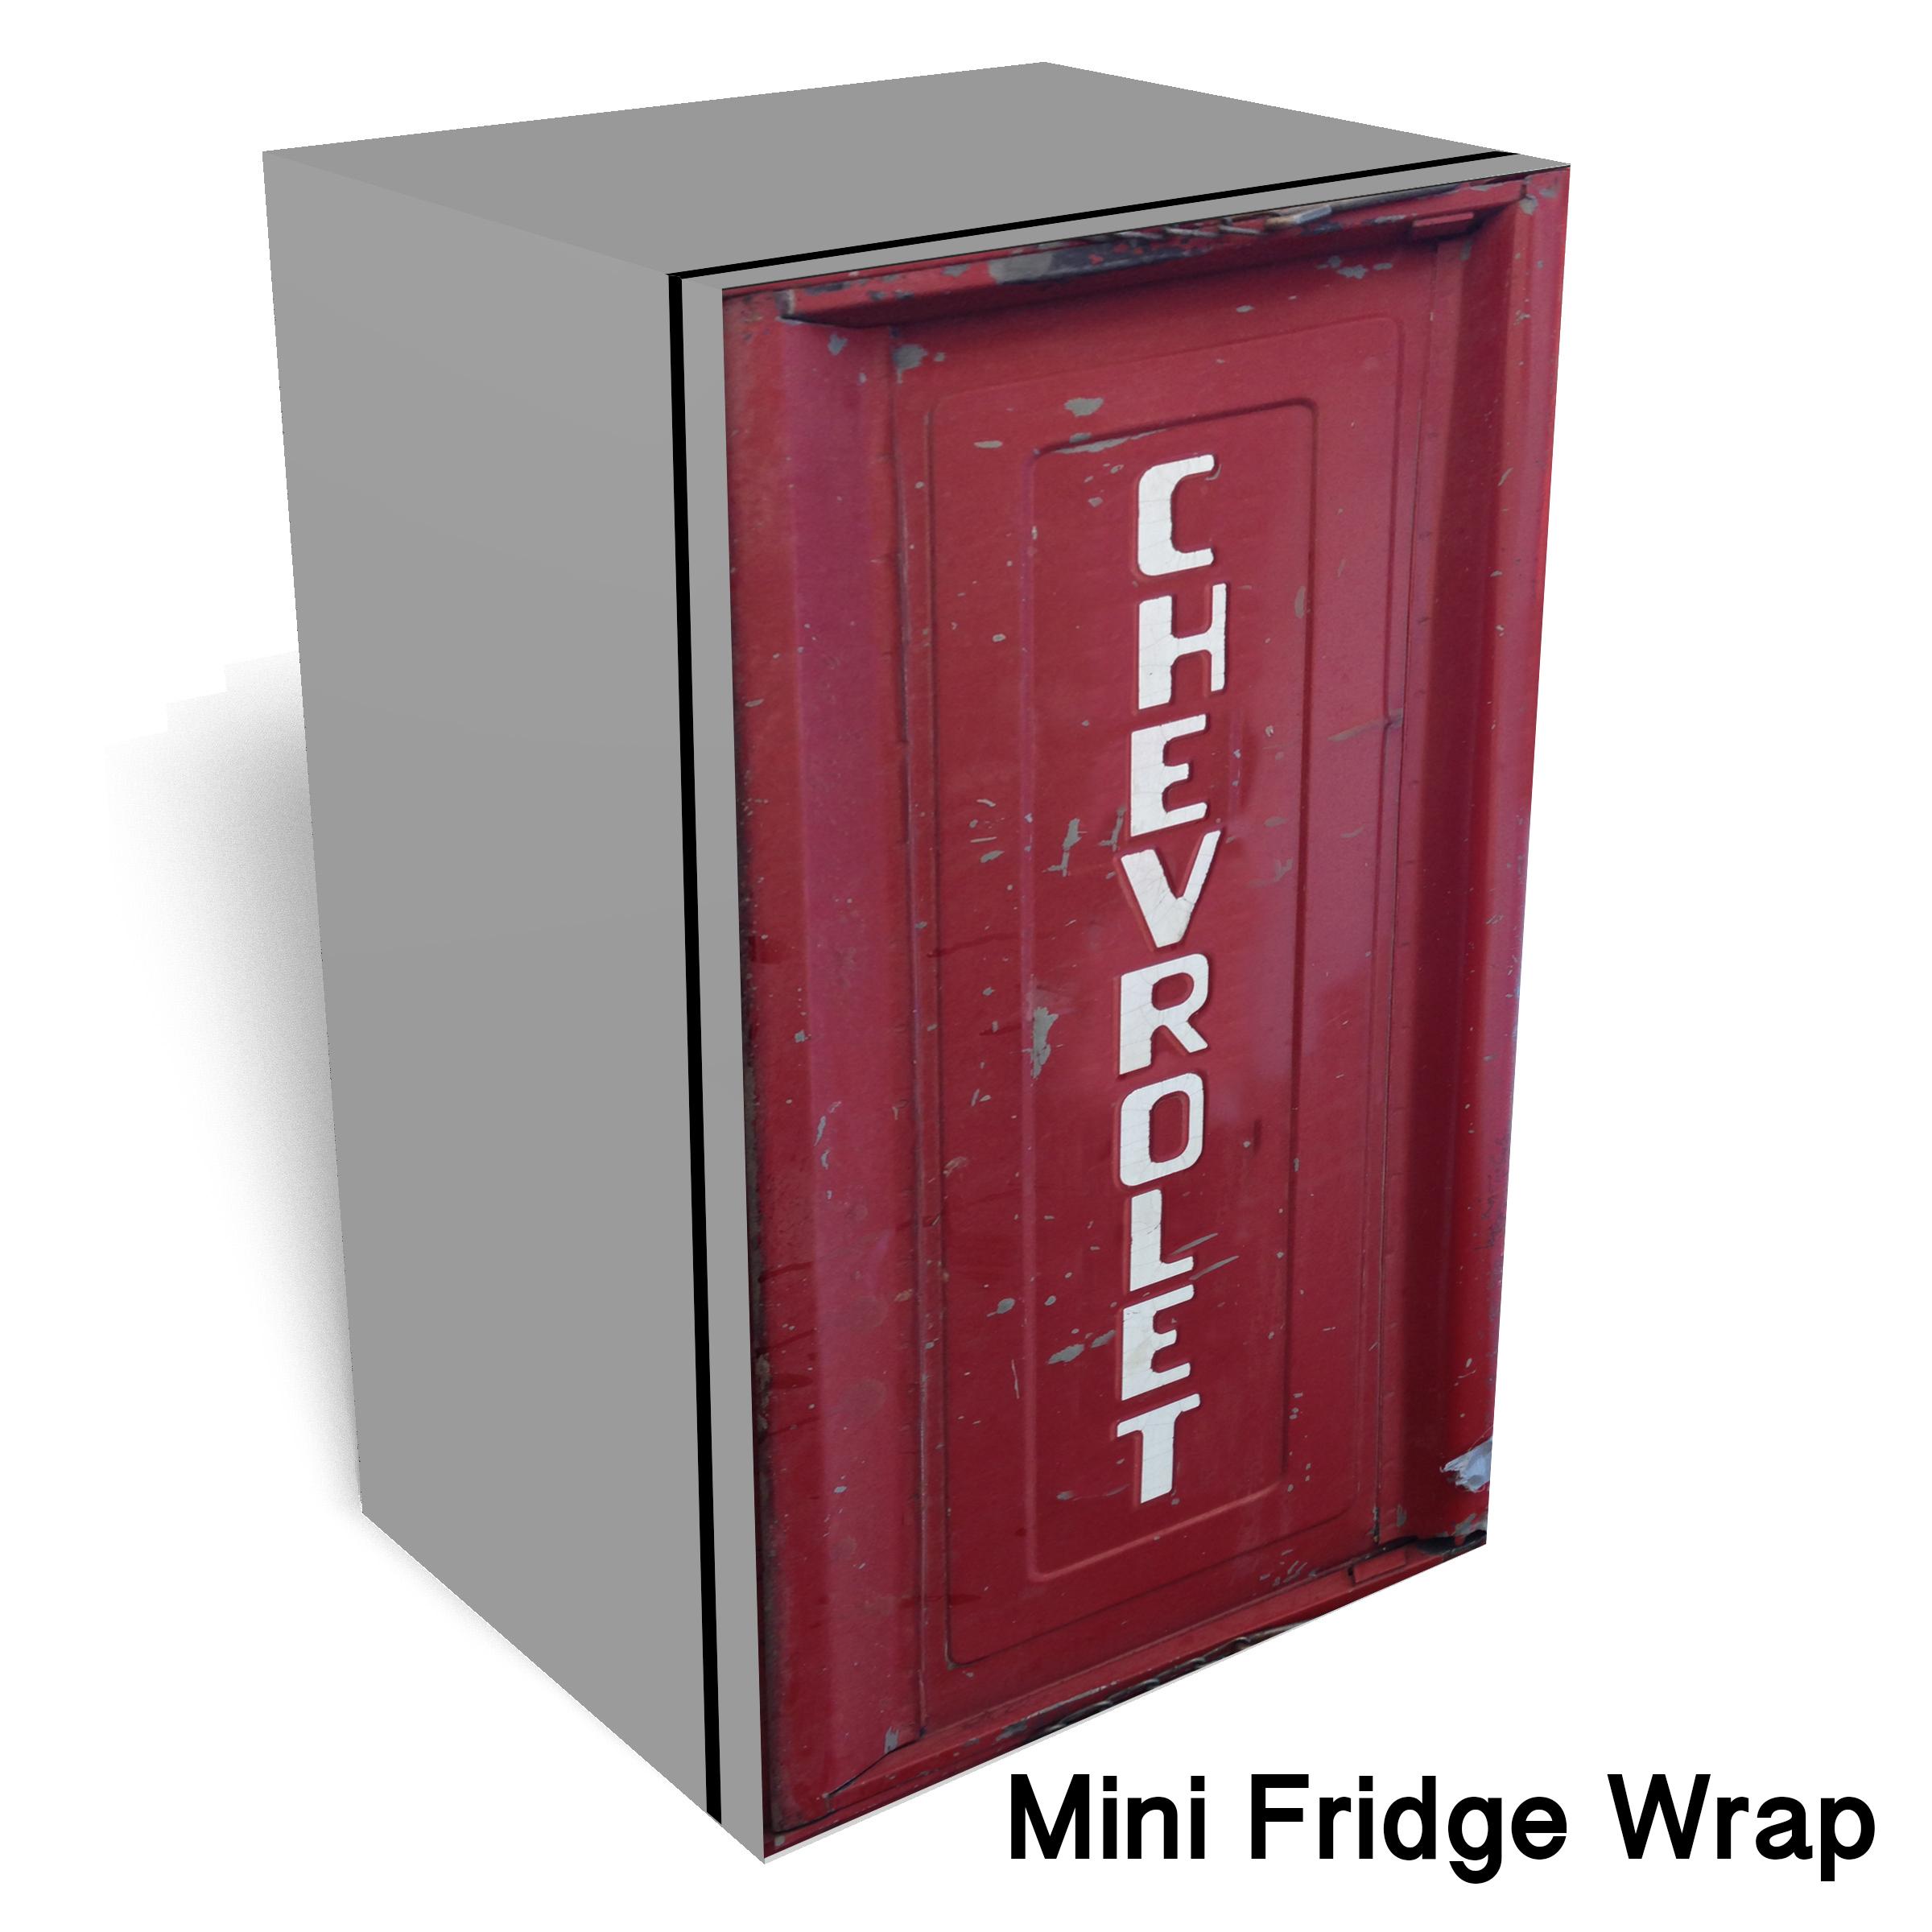 Old Chevorlet tailgate wrap sticker